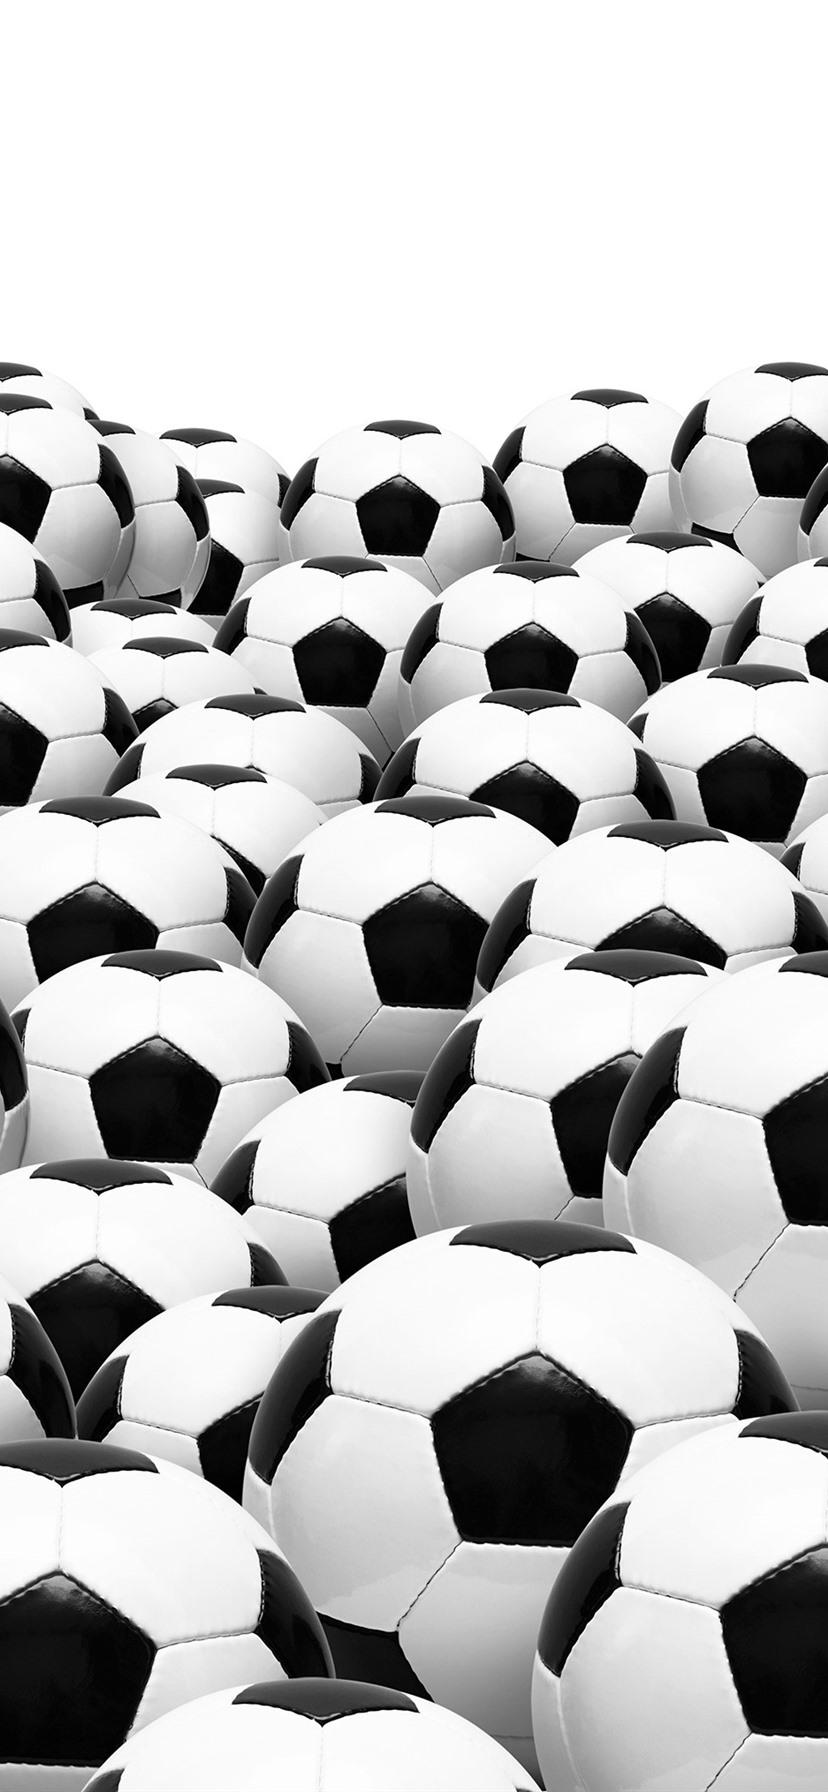 Many Footballs White Background 1080x1920 Iphone 8 7 6 6s